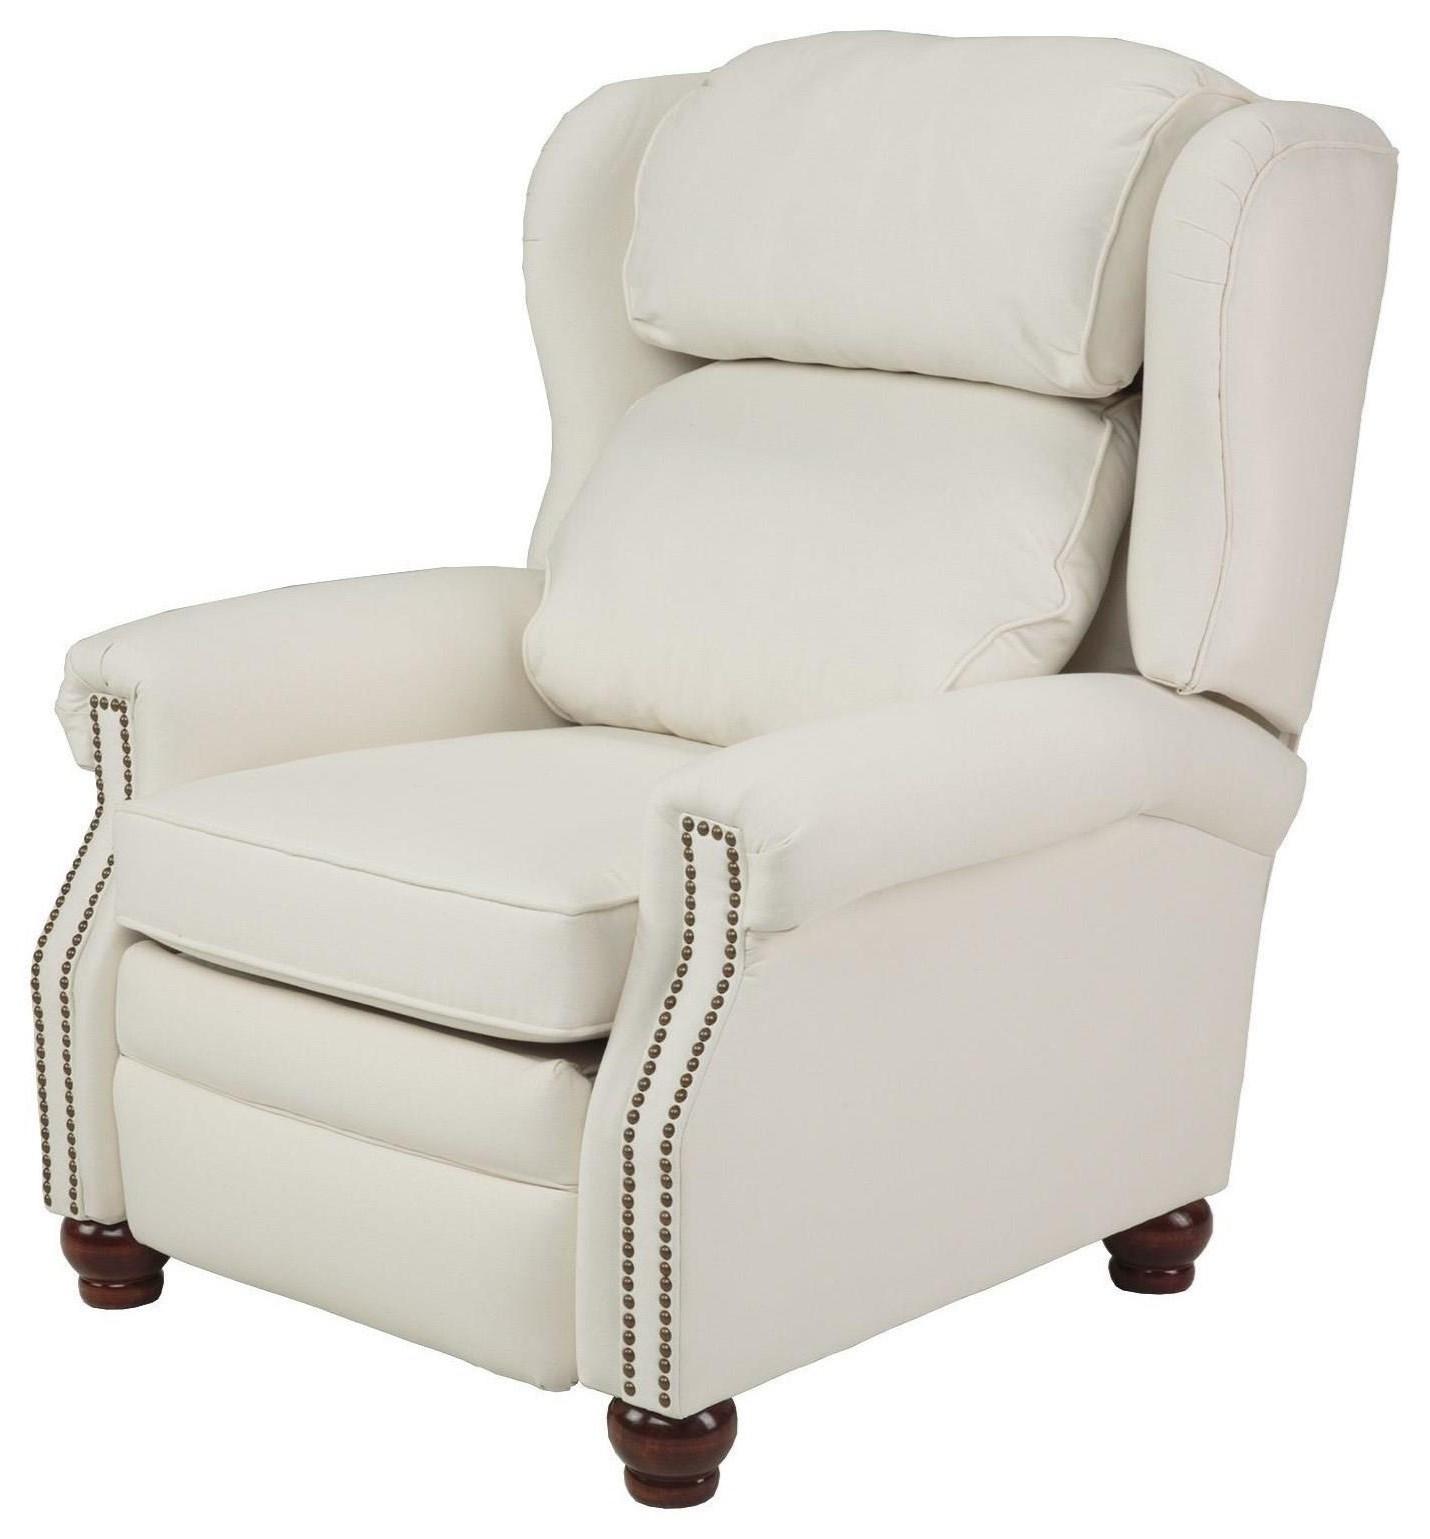 Justice Furniture Bedding Bradley Wingback Recliner Crowley Furniture Mattress Recliners